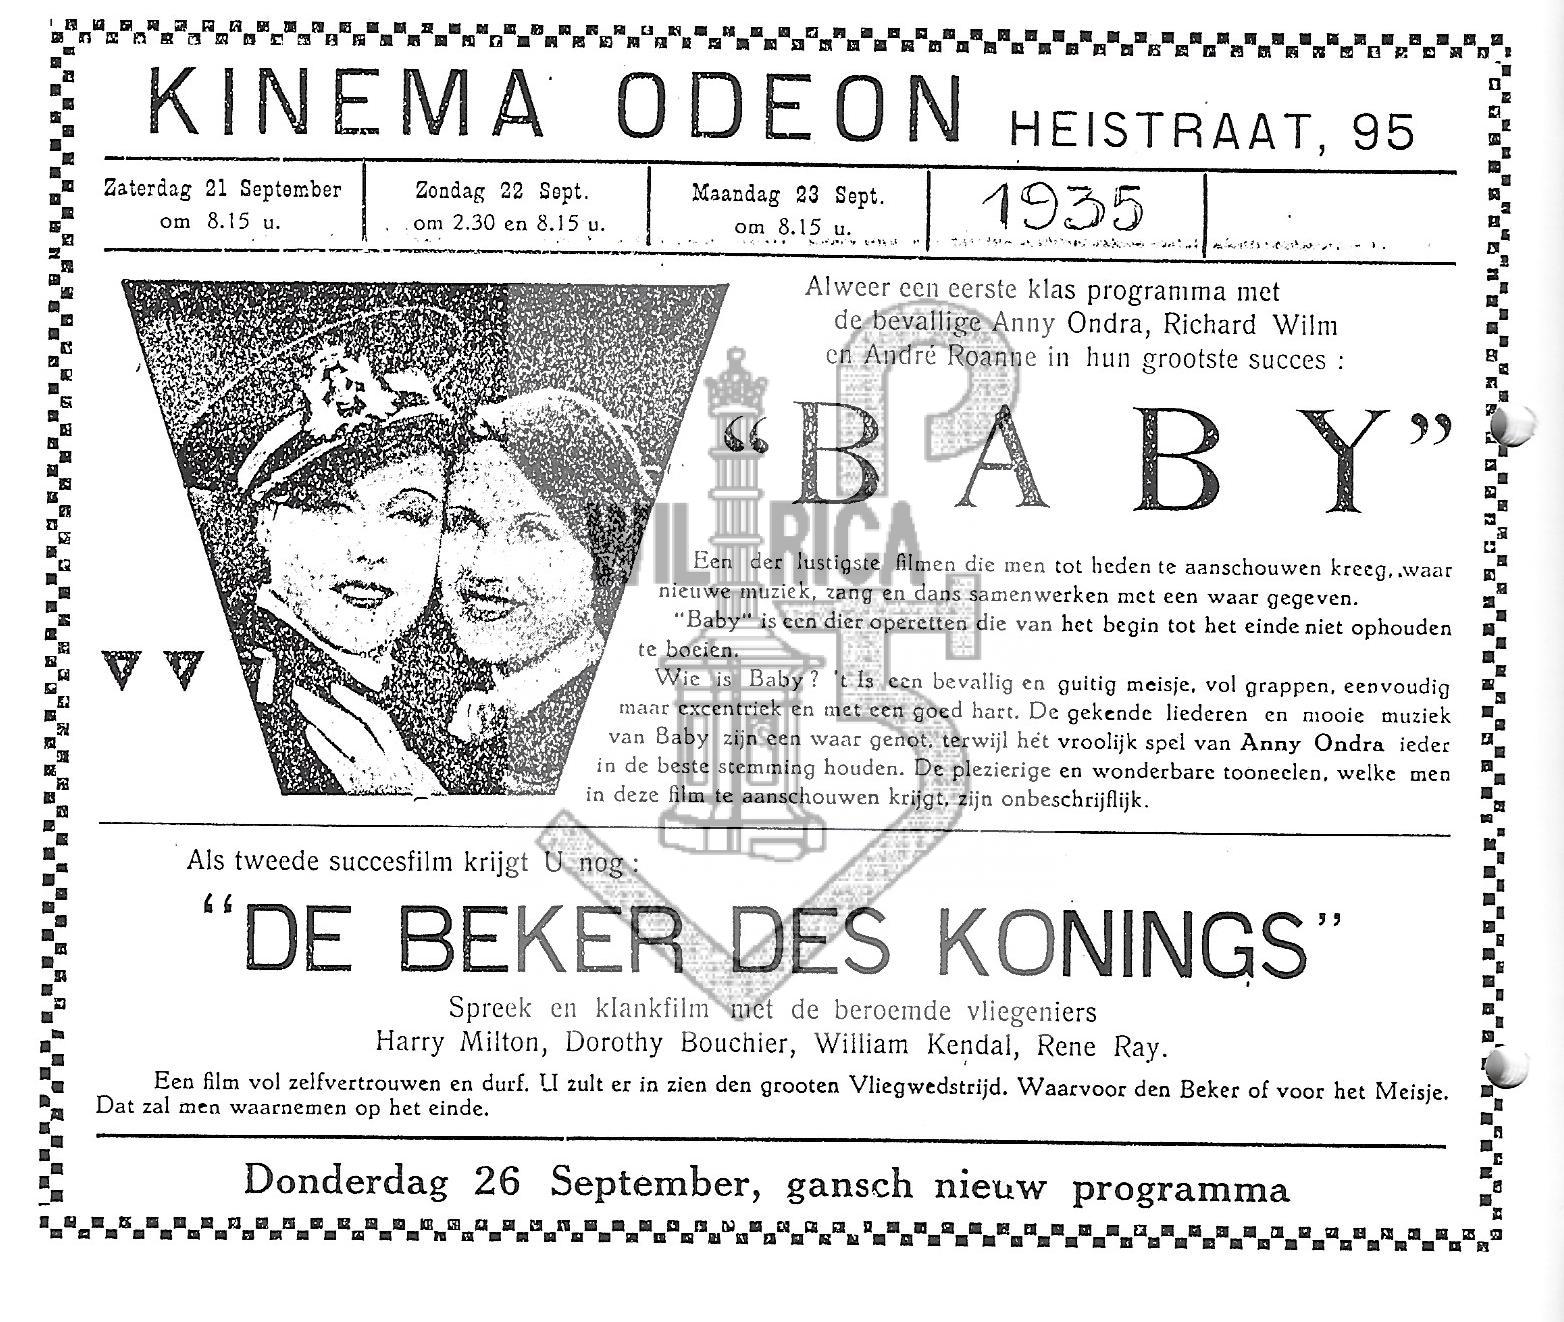 Affiche Kinema Odeon